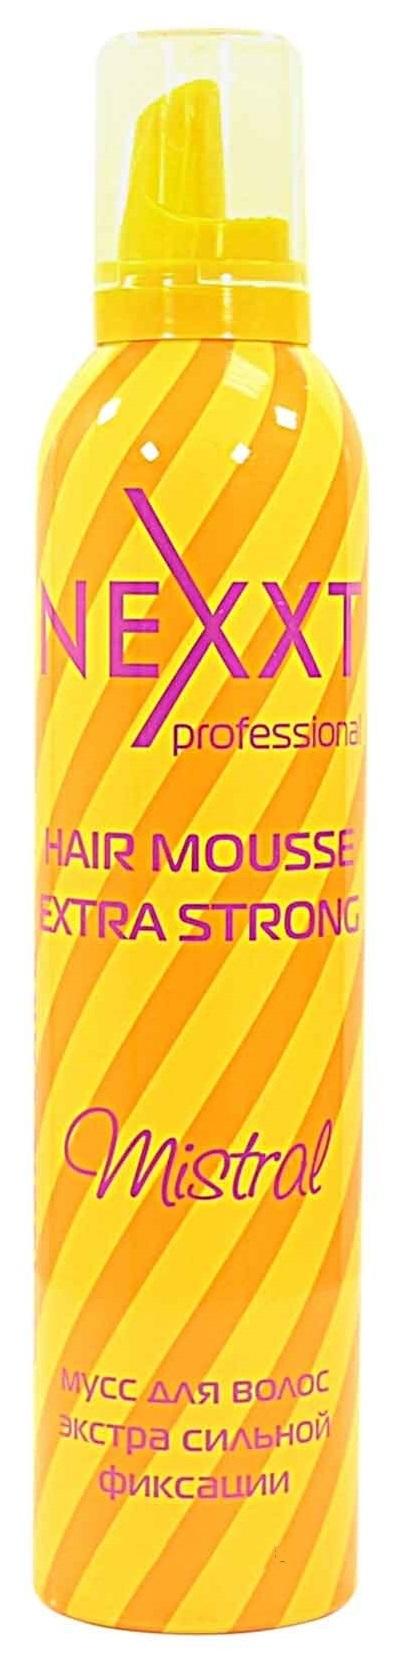 NEXXT professional Мусс экстра сильной фиксации для волос / Stylig Mouse Extra Strong Mistral 200 мл